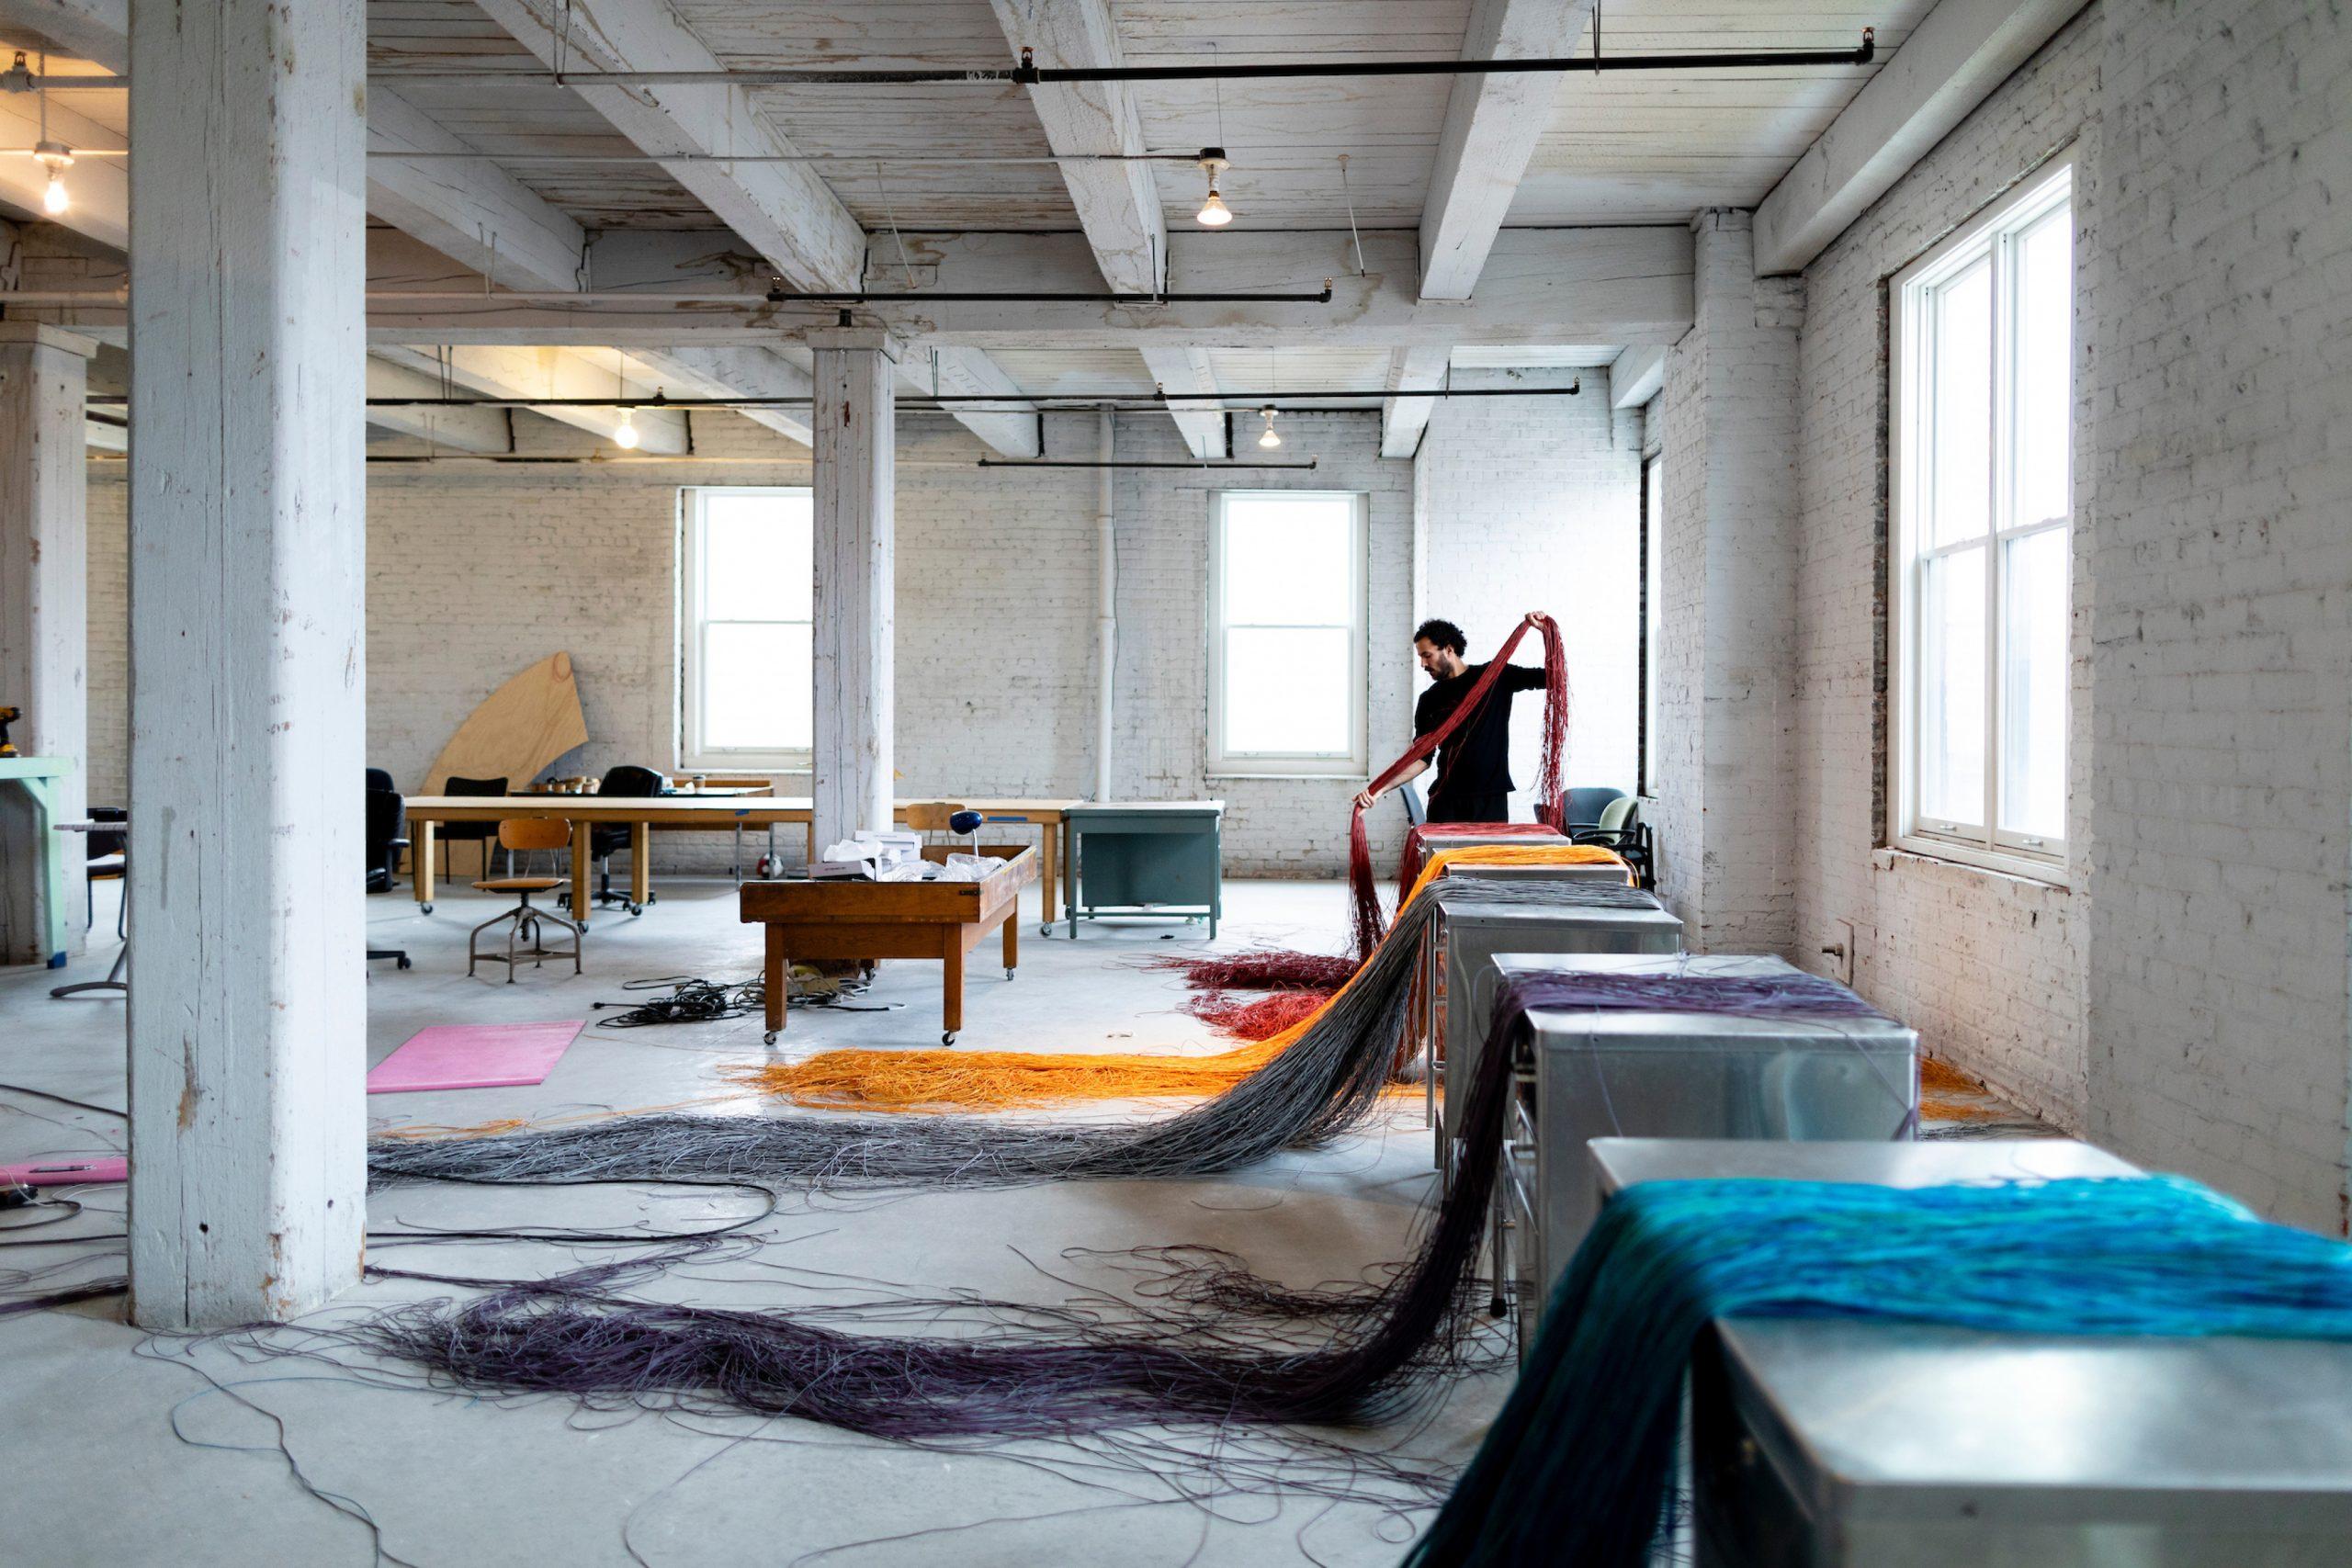 Marc Vilanova Pinyol at Bemis Center for Contemporary Arts. Photo by Colin Conces.